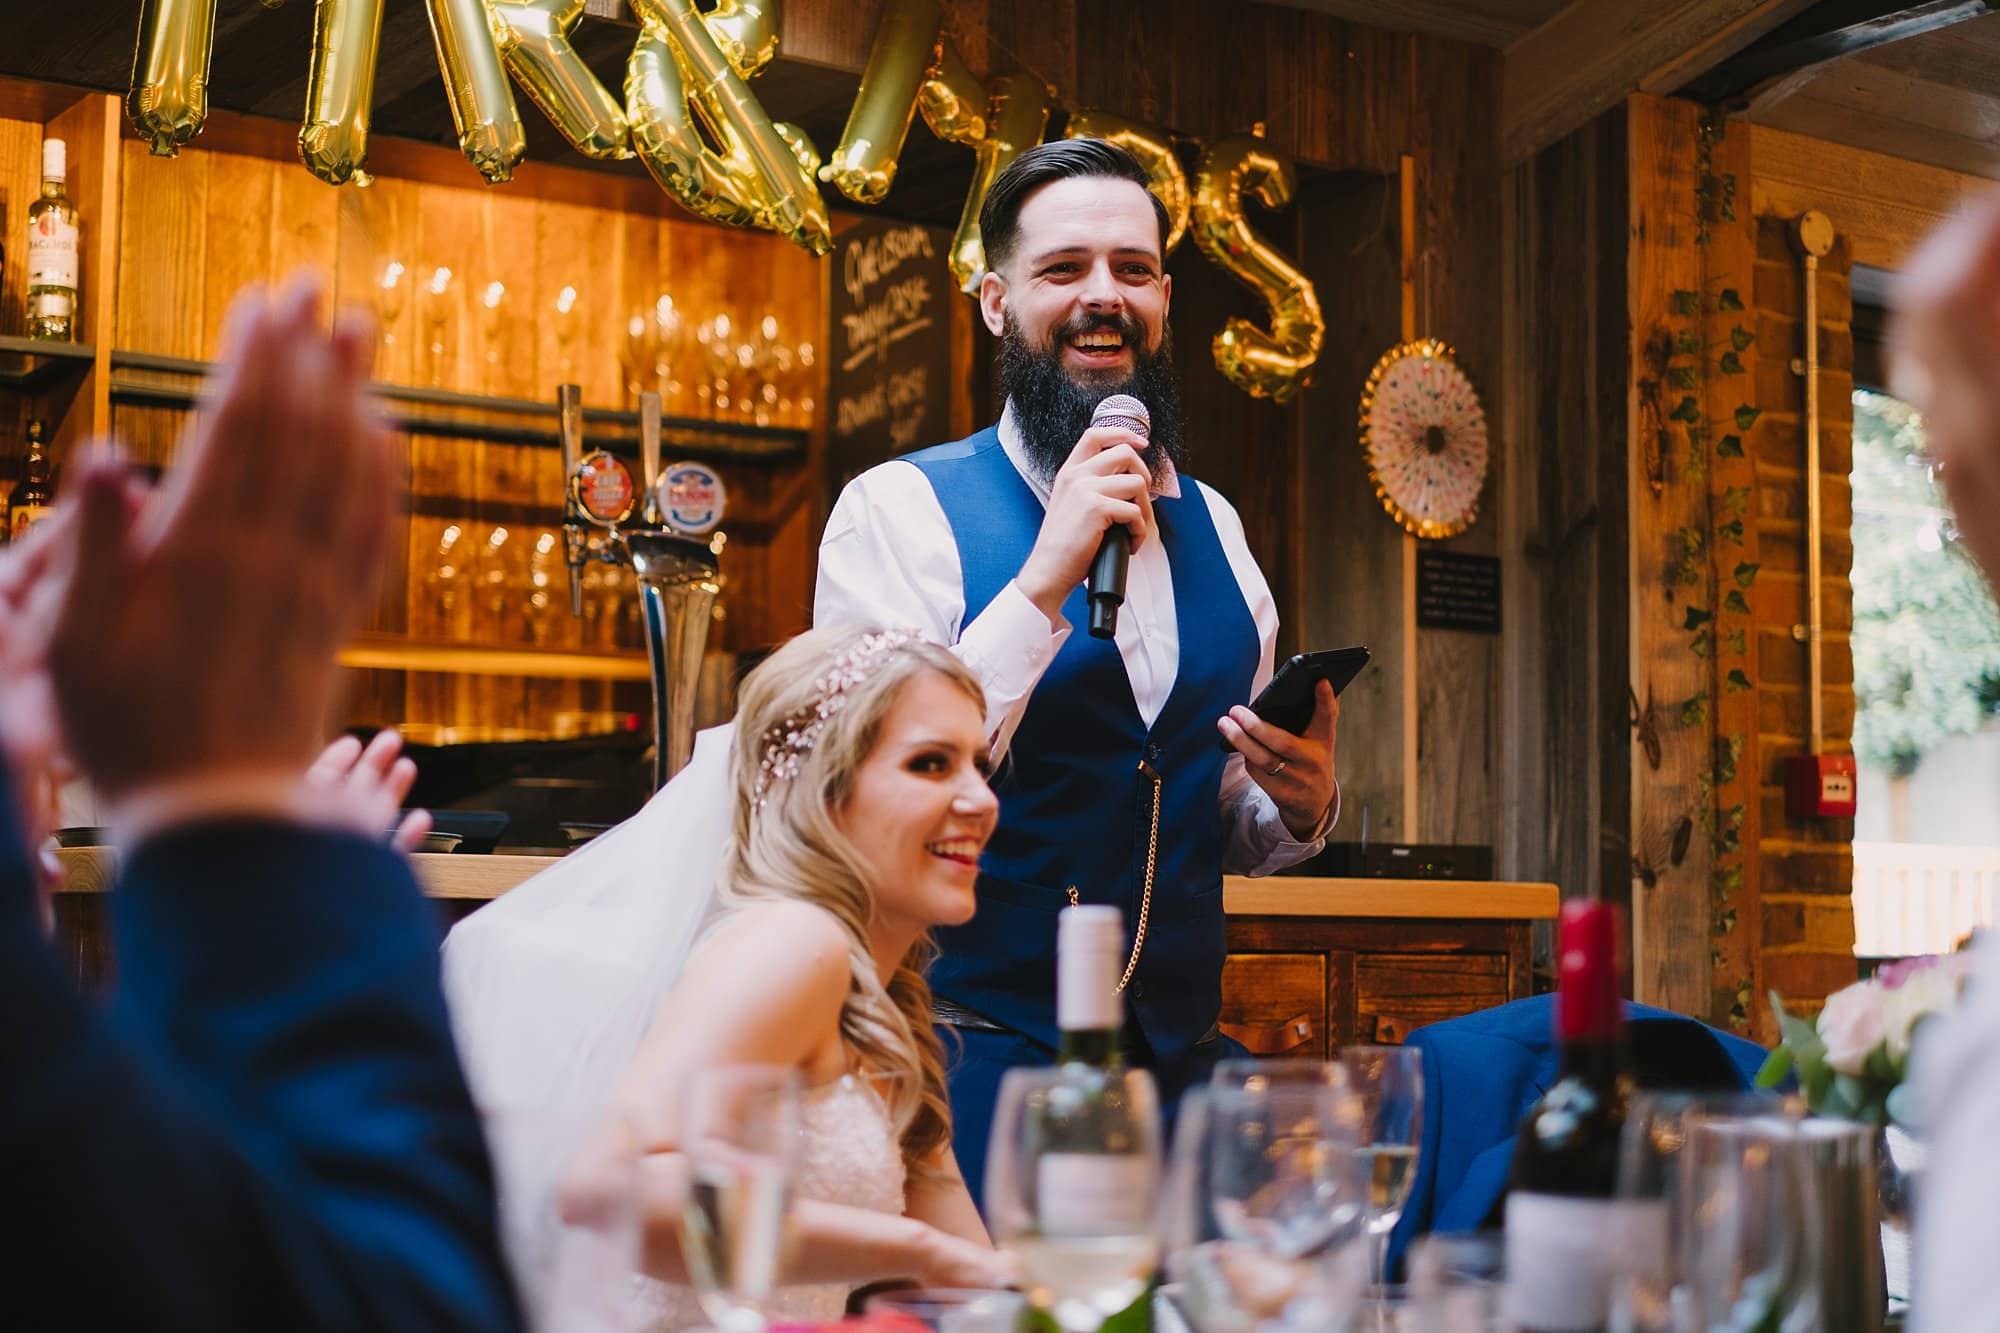 london pub wedding photographer jn 045 - The County Arms Wedding Photographer   Jen & Nick